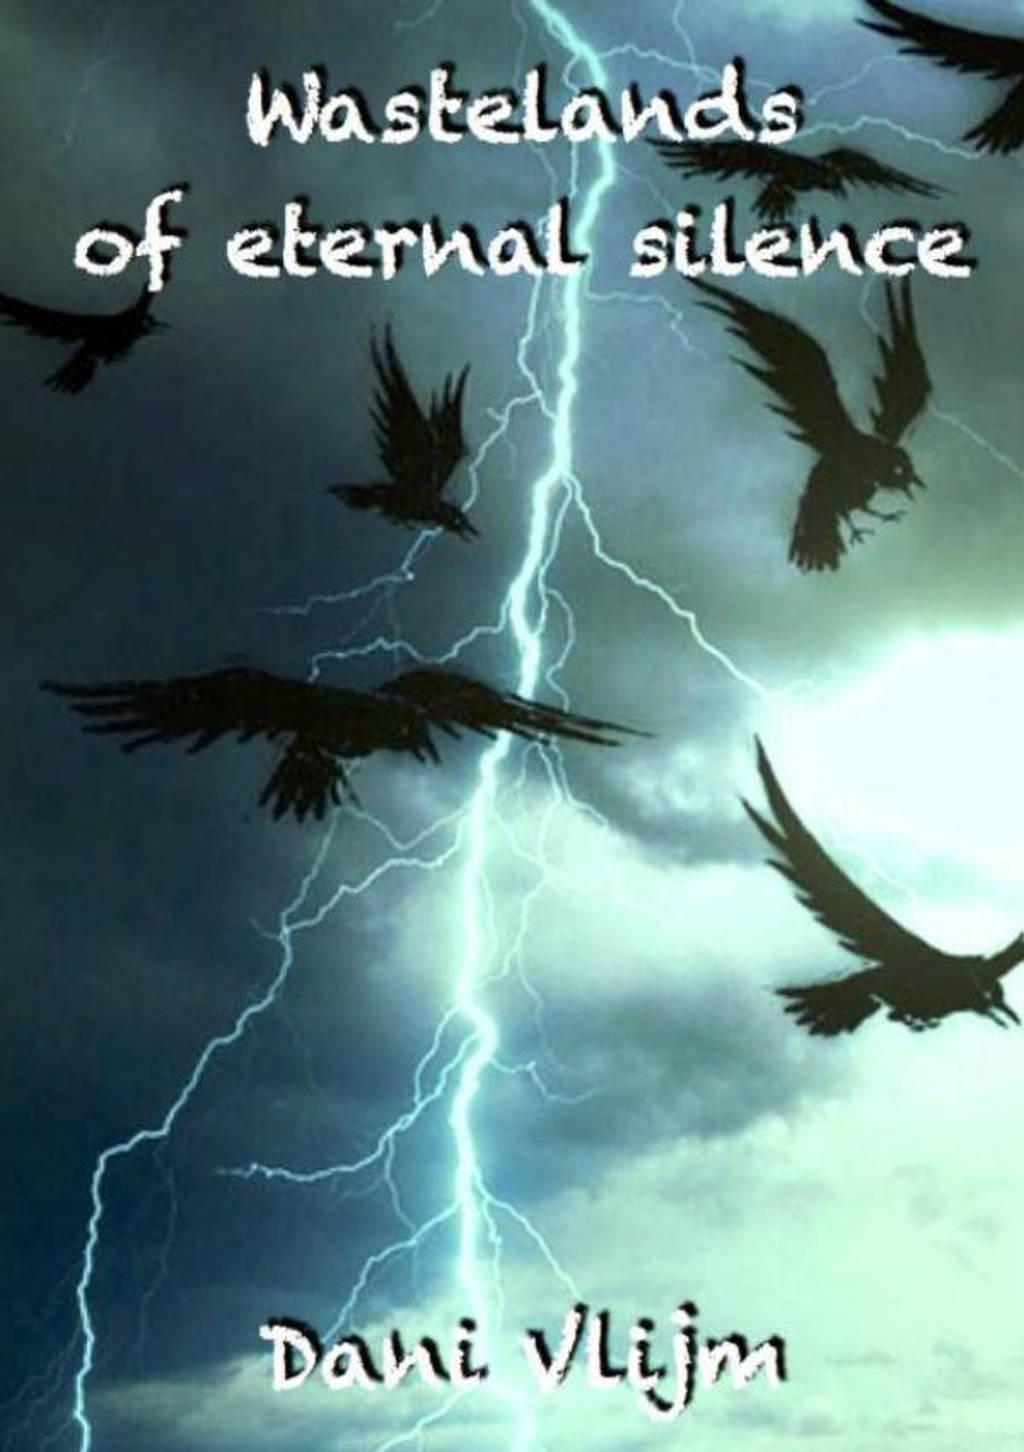 Wastelands of eternal silence - Dani Vlijm